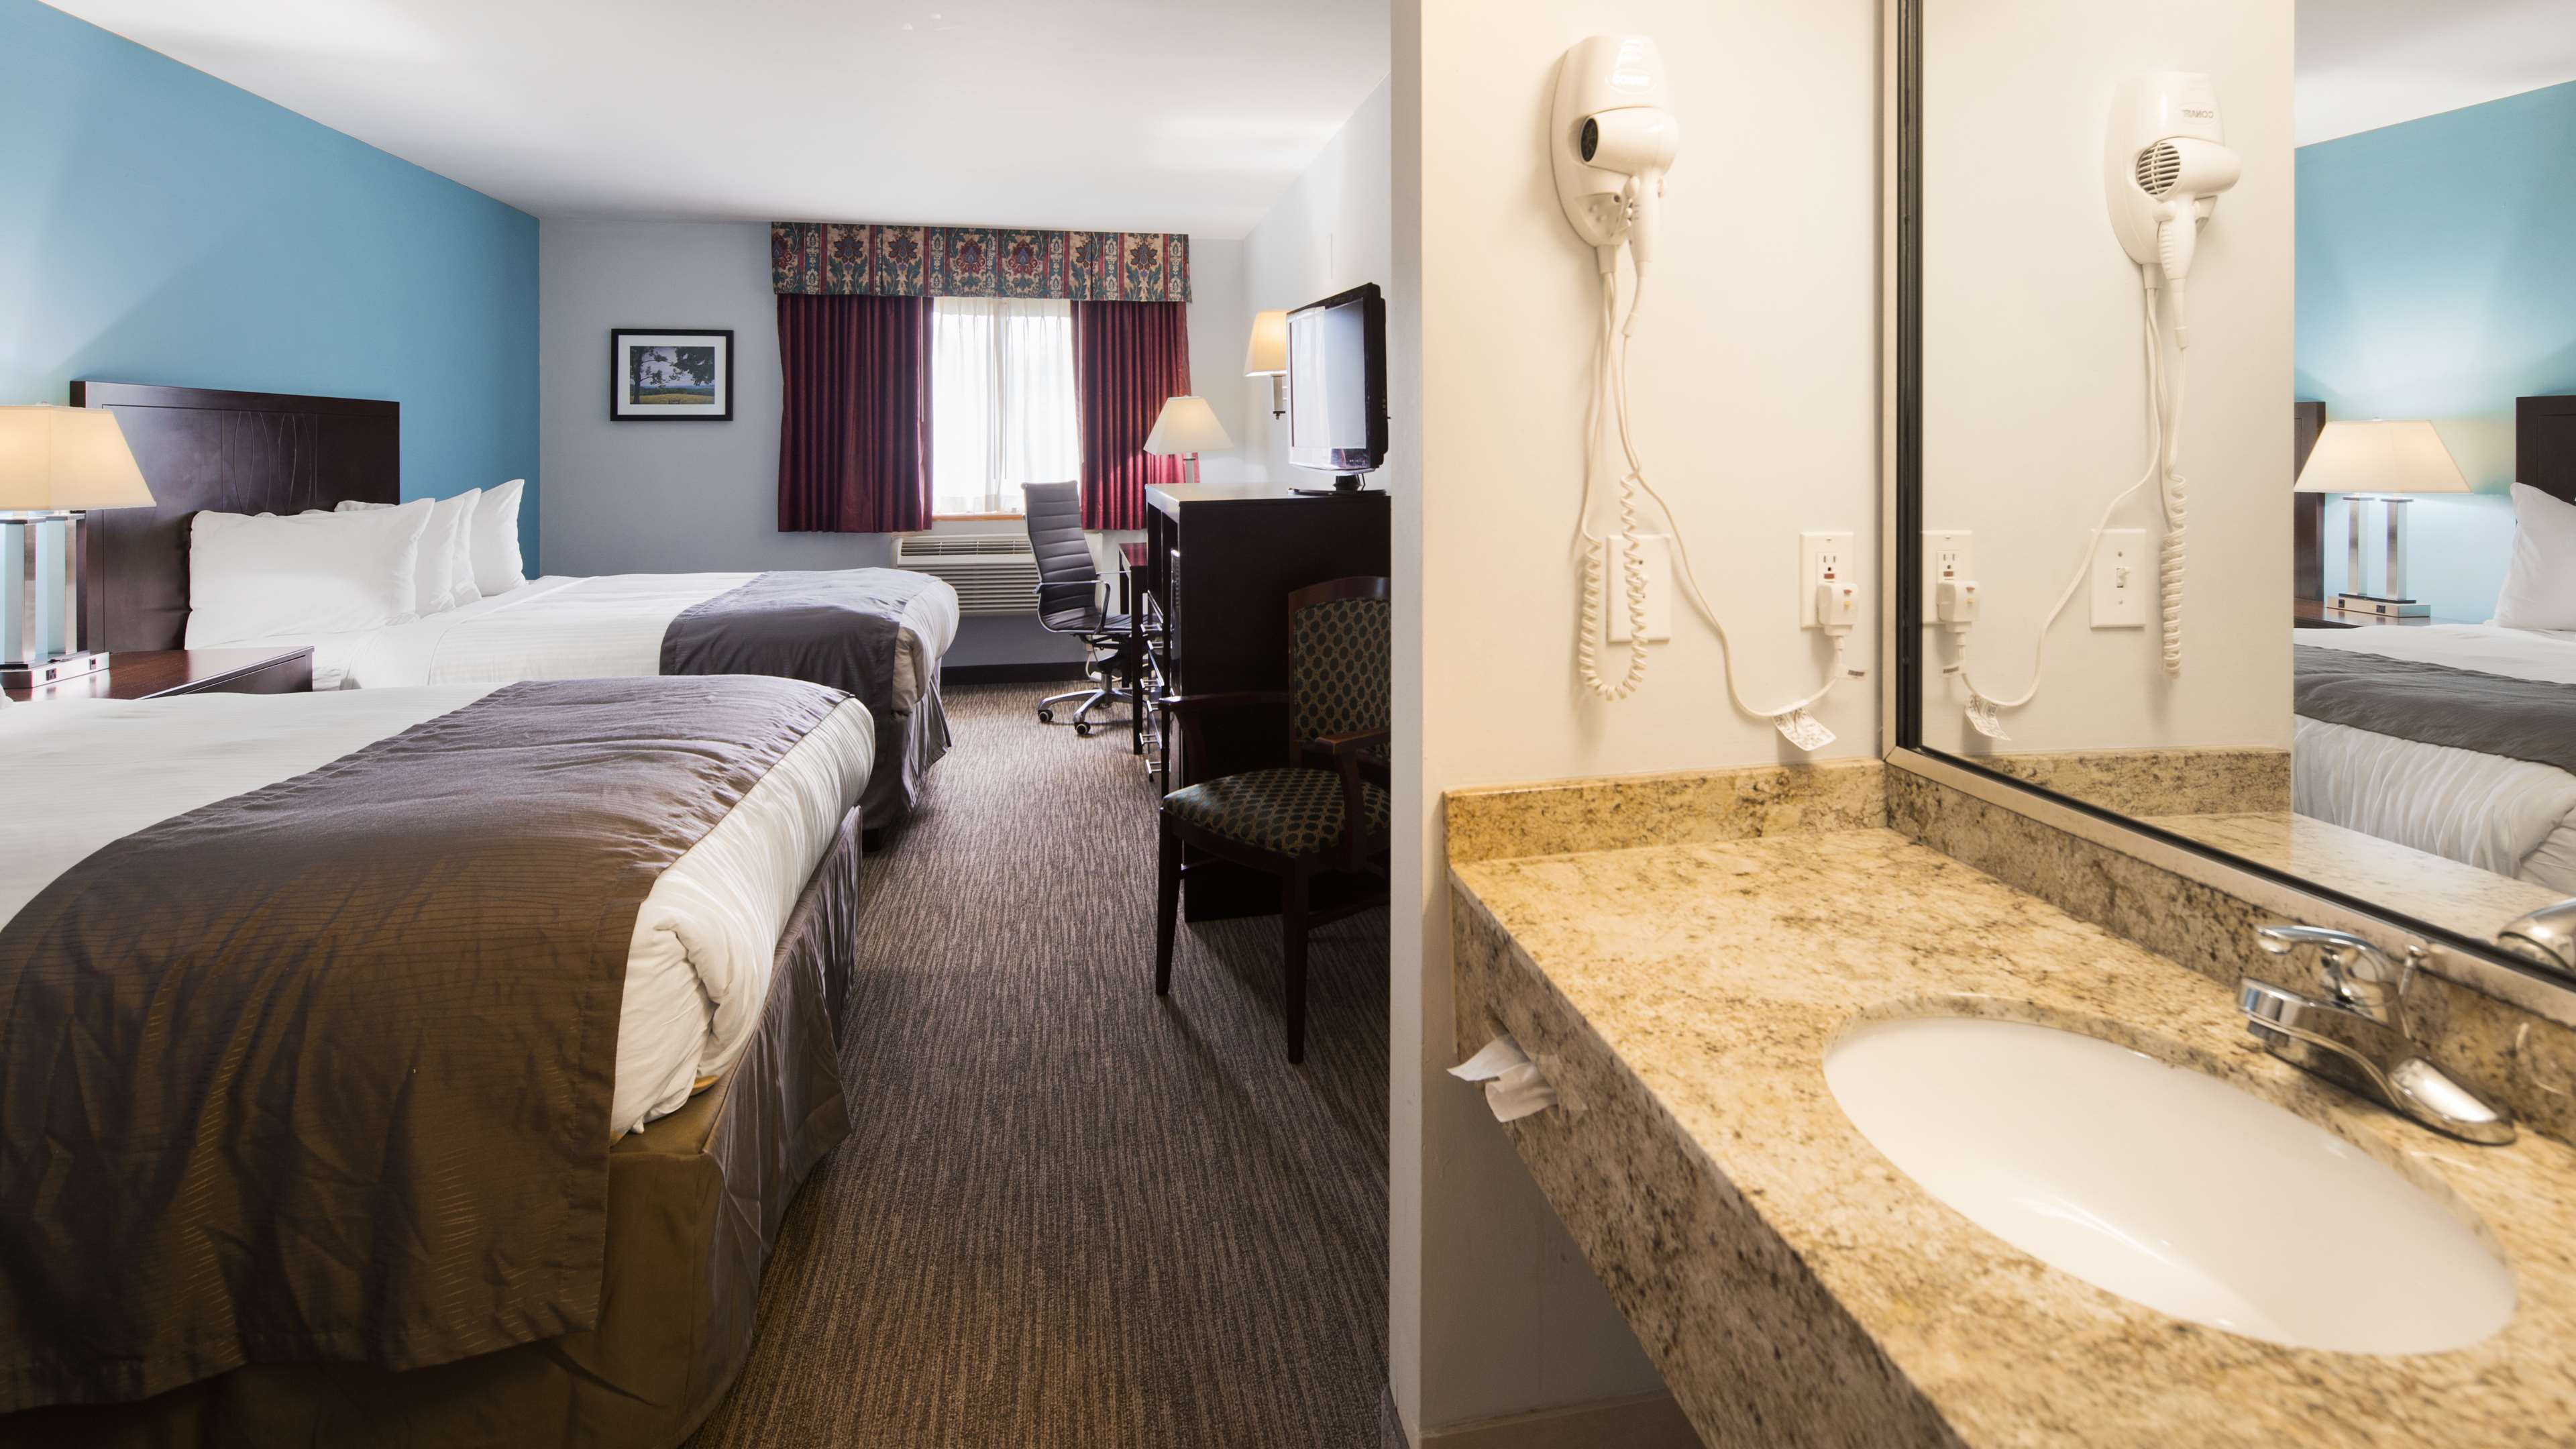 Best Western New Baltimore Inn image 19